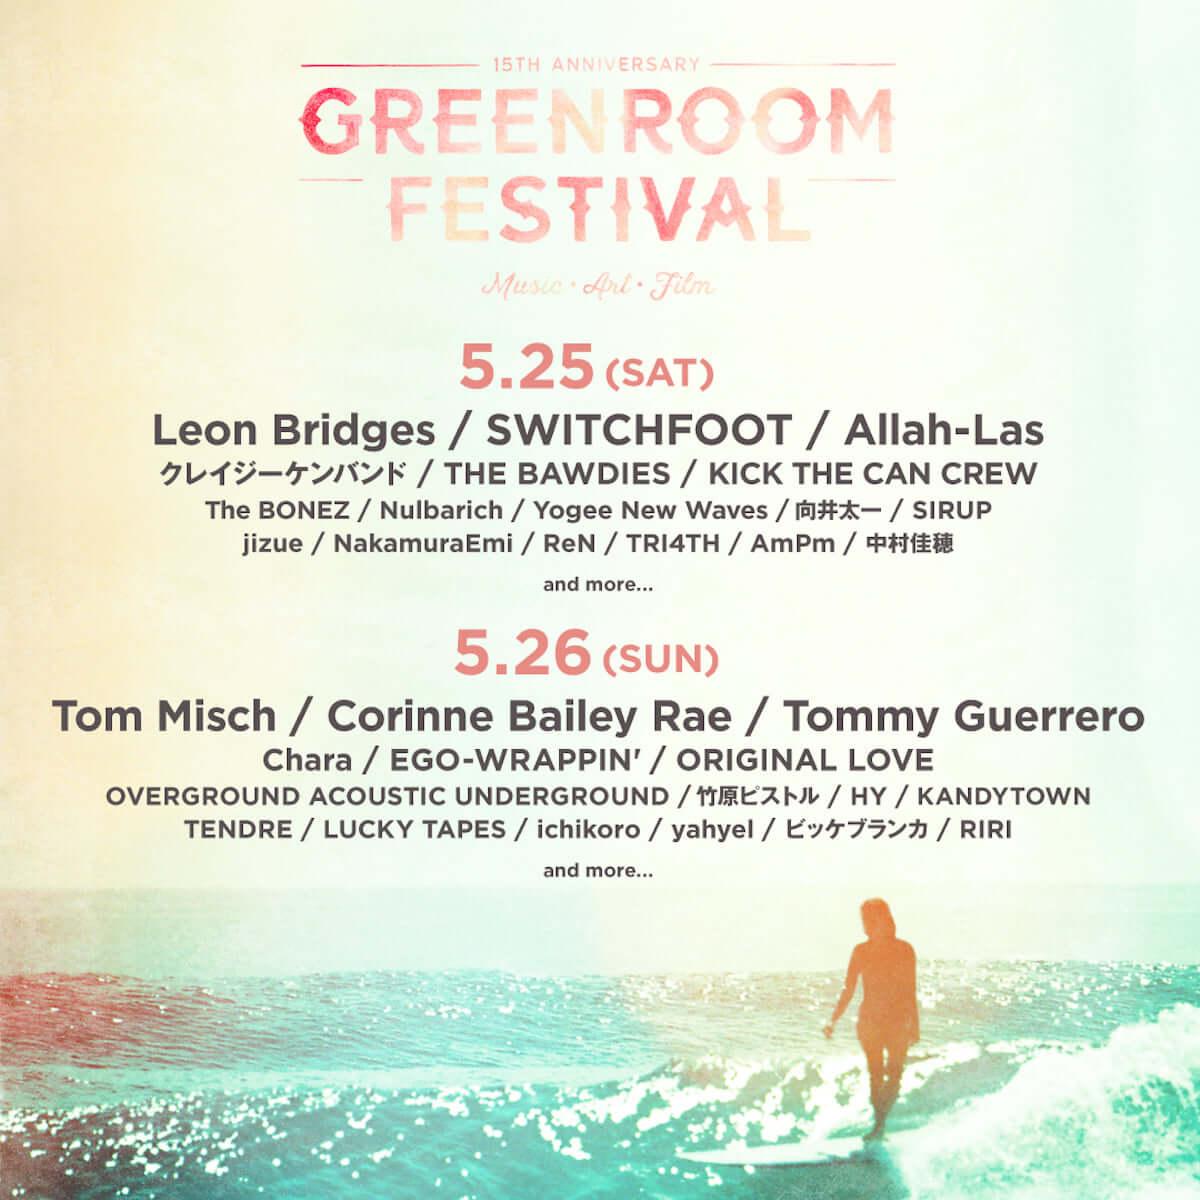 <GREENROOM FESTIVAL '19>、第1弾アートエキシビション発表|当日はアーティストたち本人が在廊予定 music190329_greenroomfestival_3-1200x1200